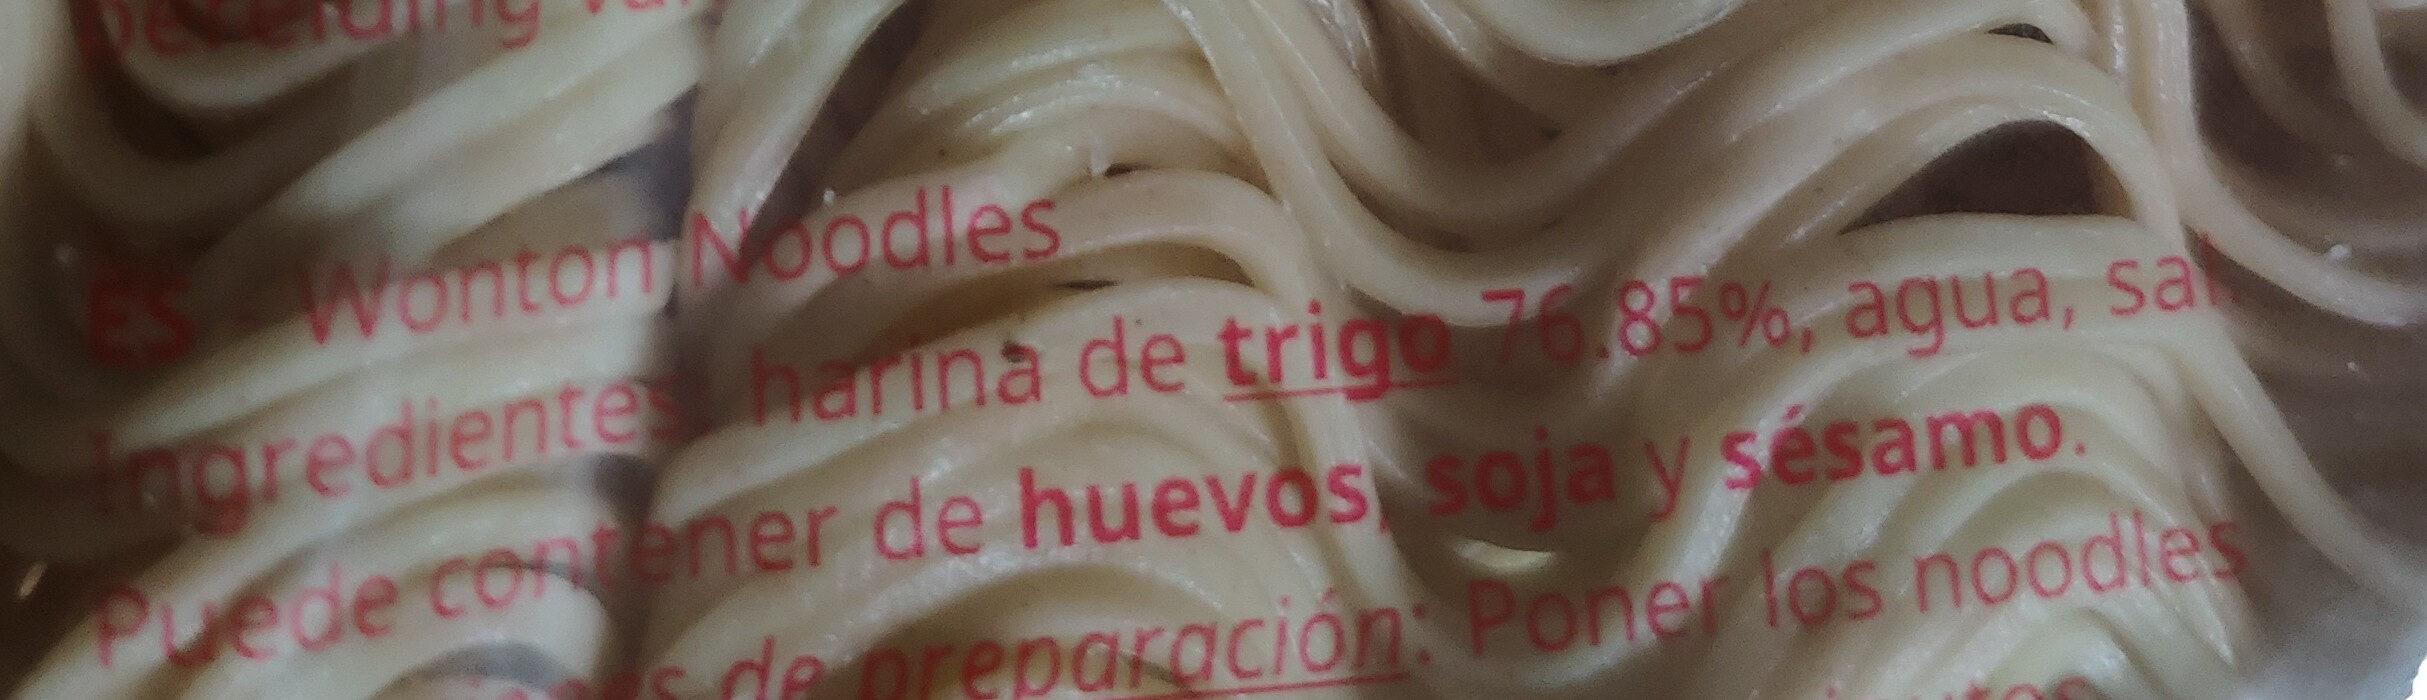 Mie Kering Asli Wonton Noodles - Ingredientes - es